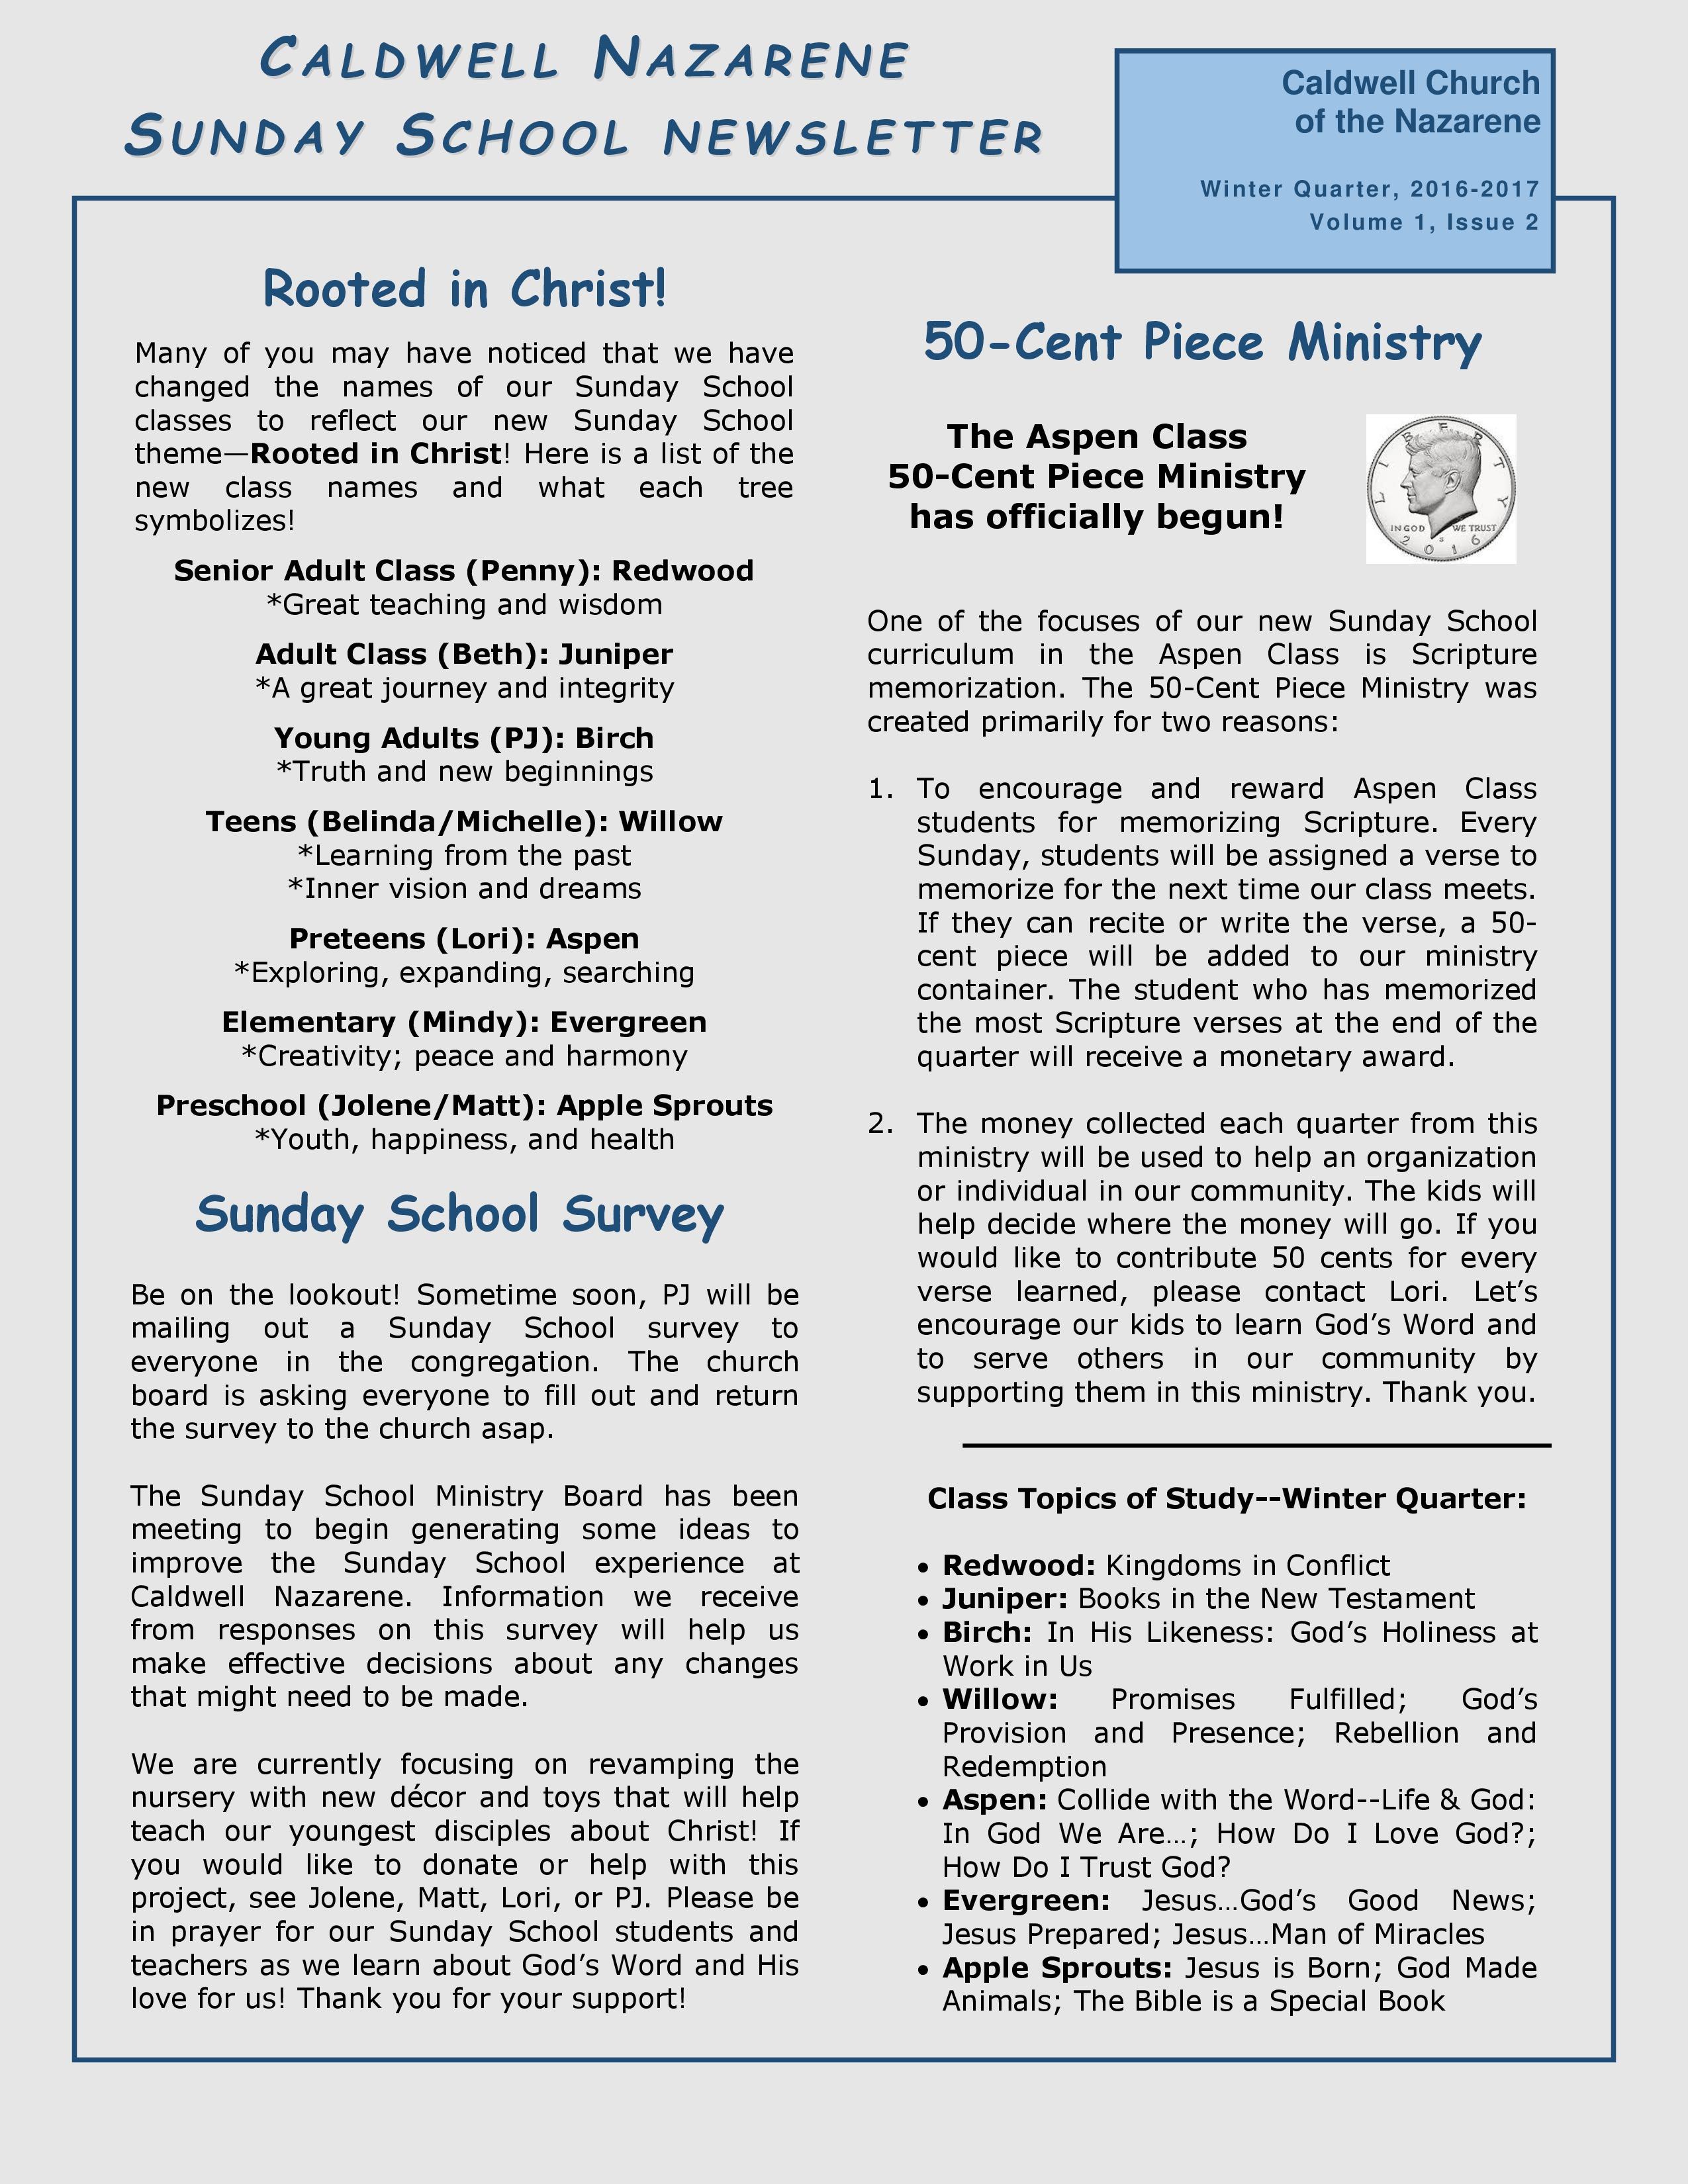 Caldwell Church of the Nazarene: Sunday School Newsletter